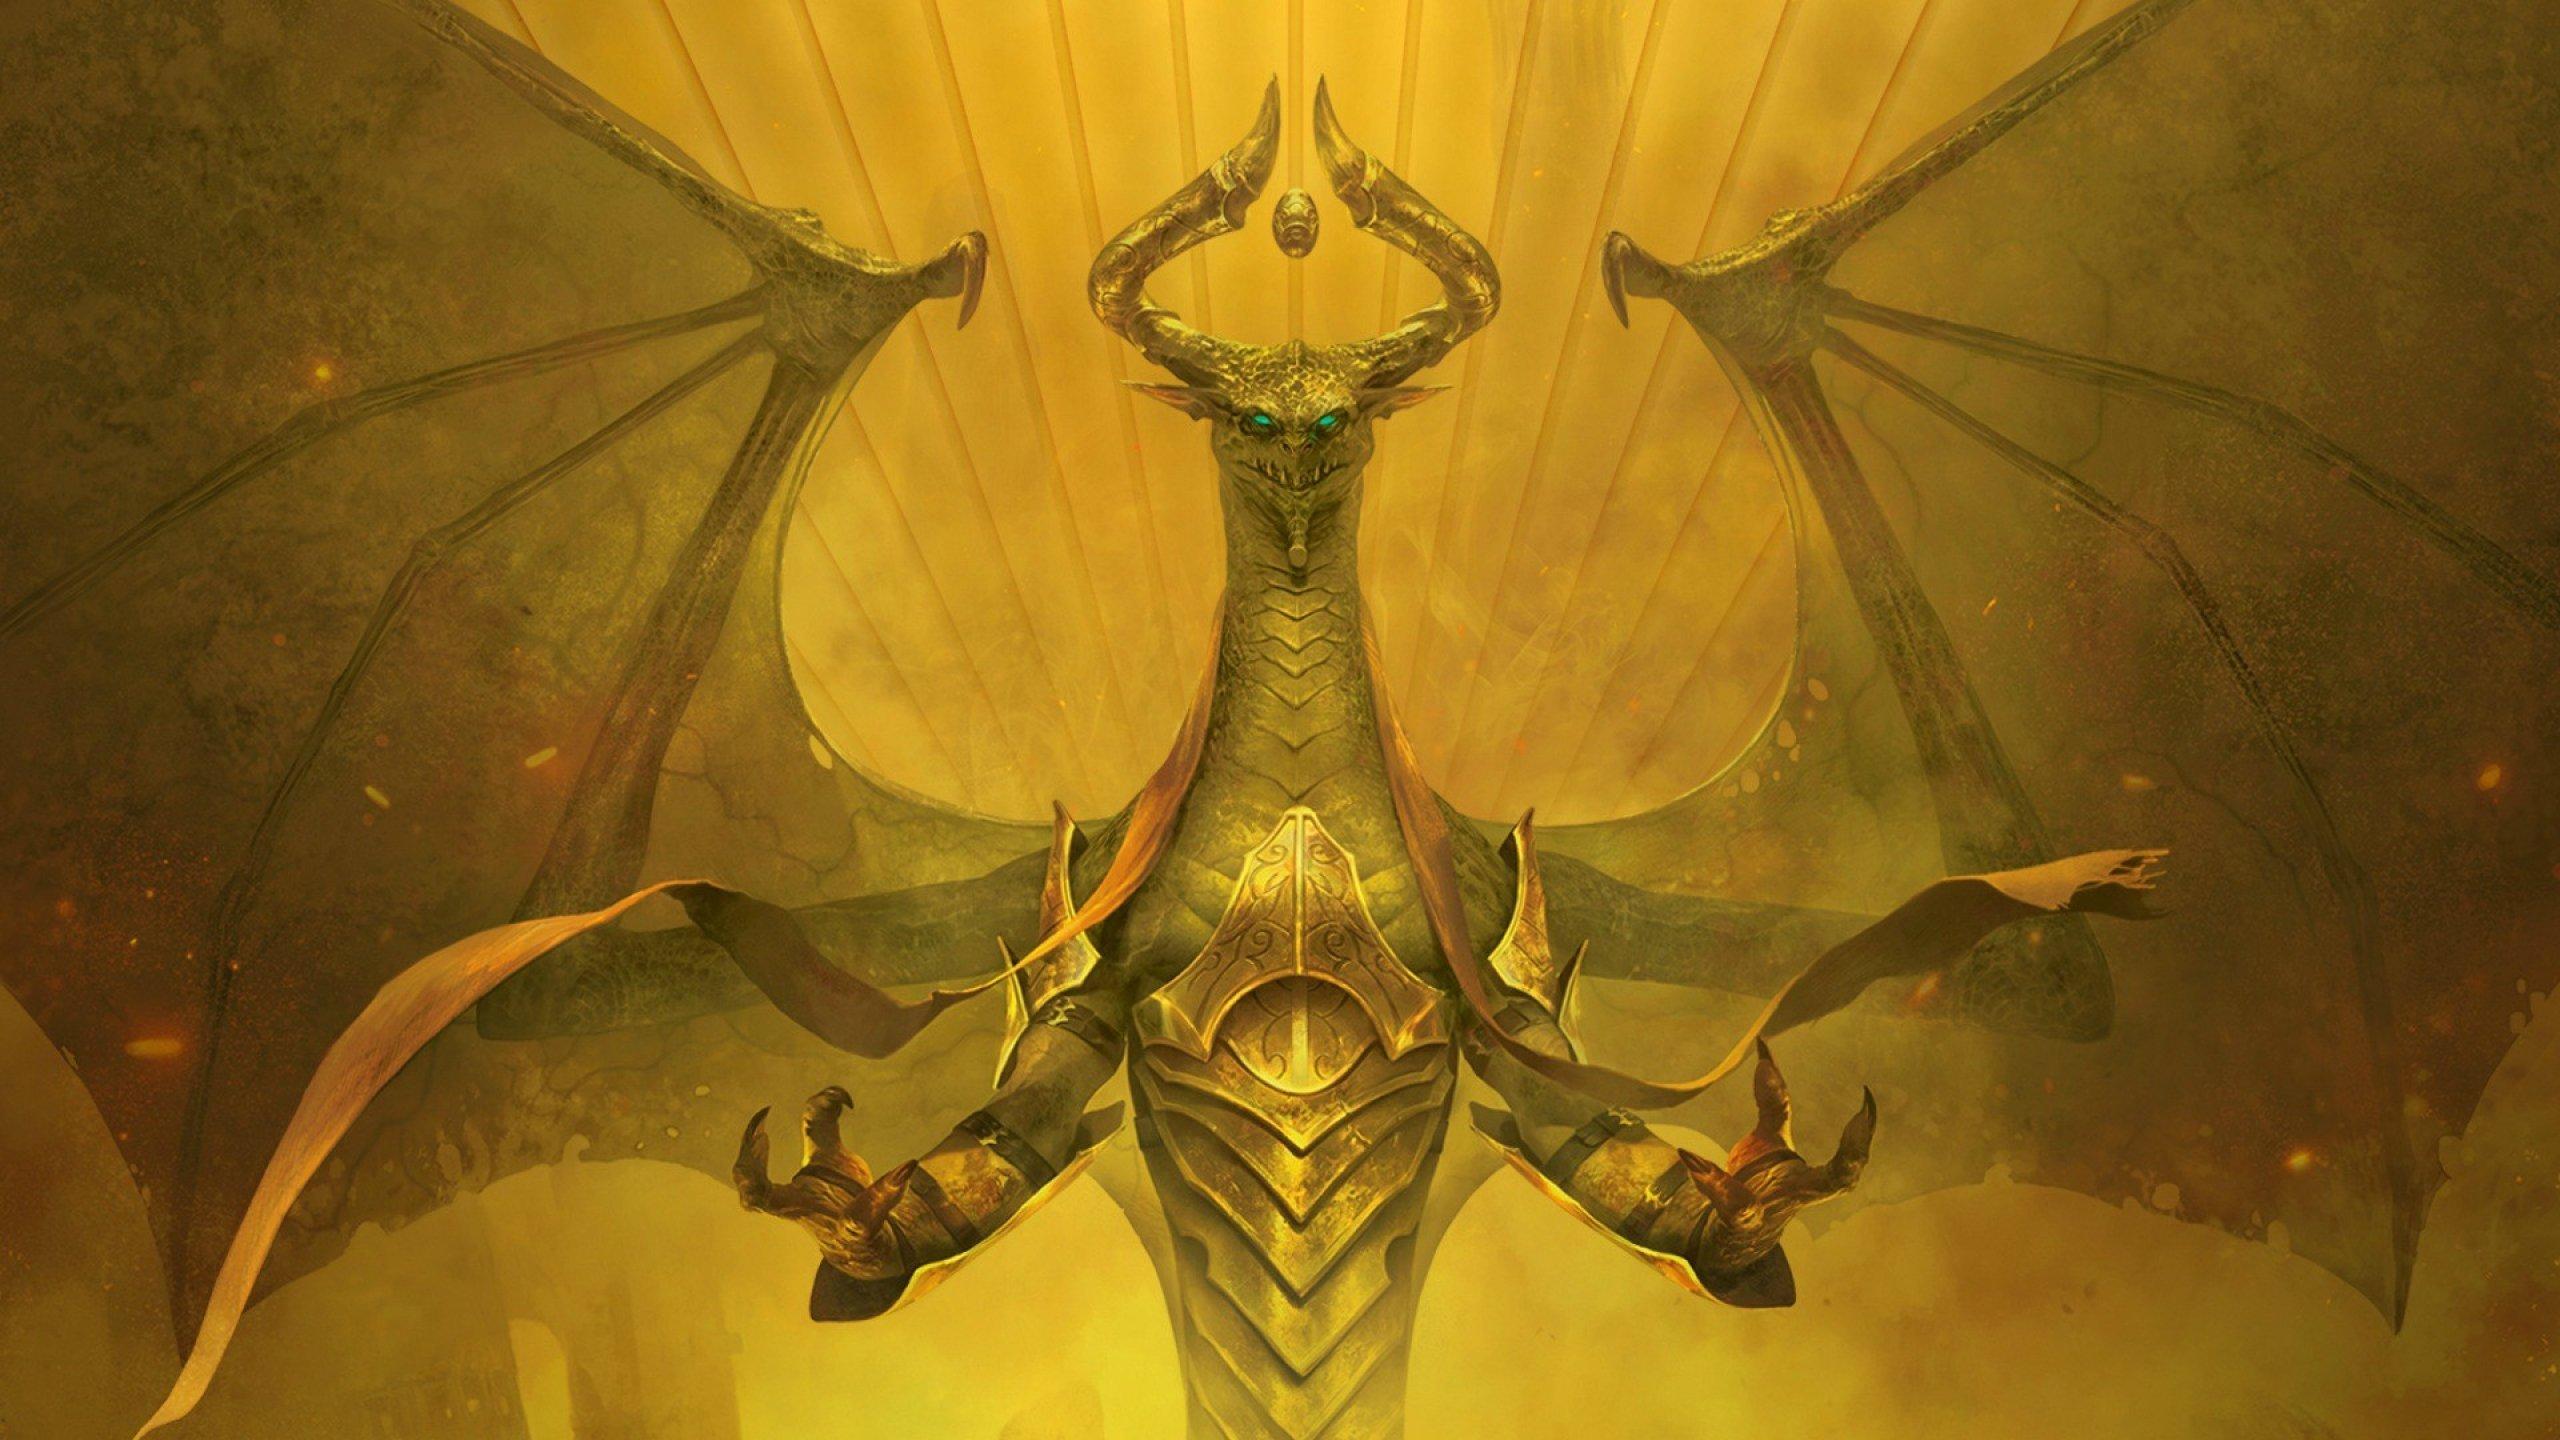 Magic the gathering wallpaper dragon